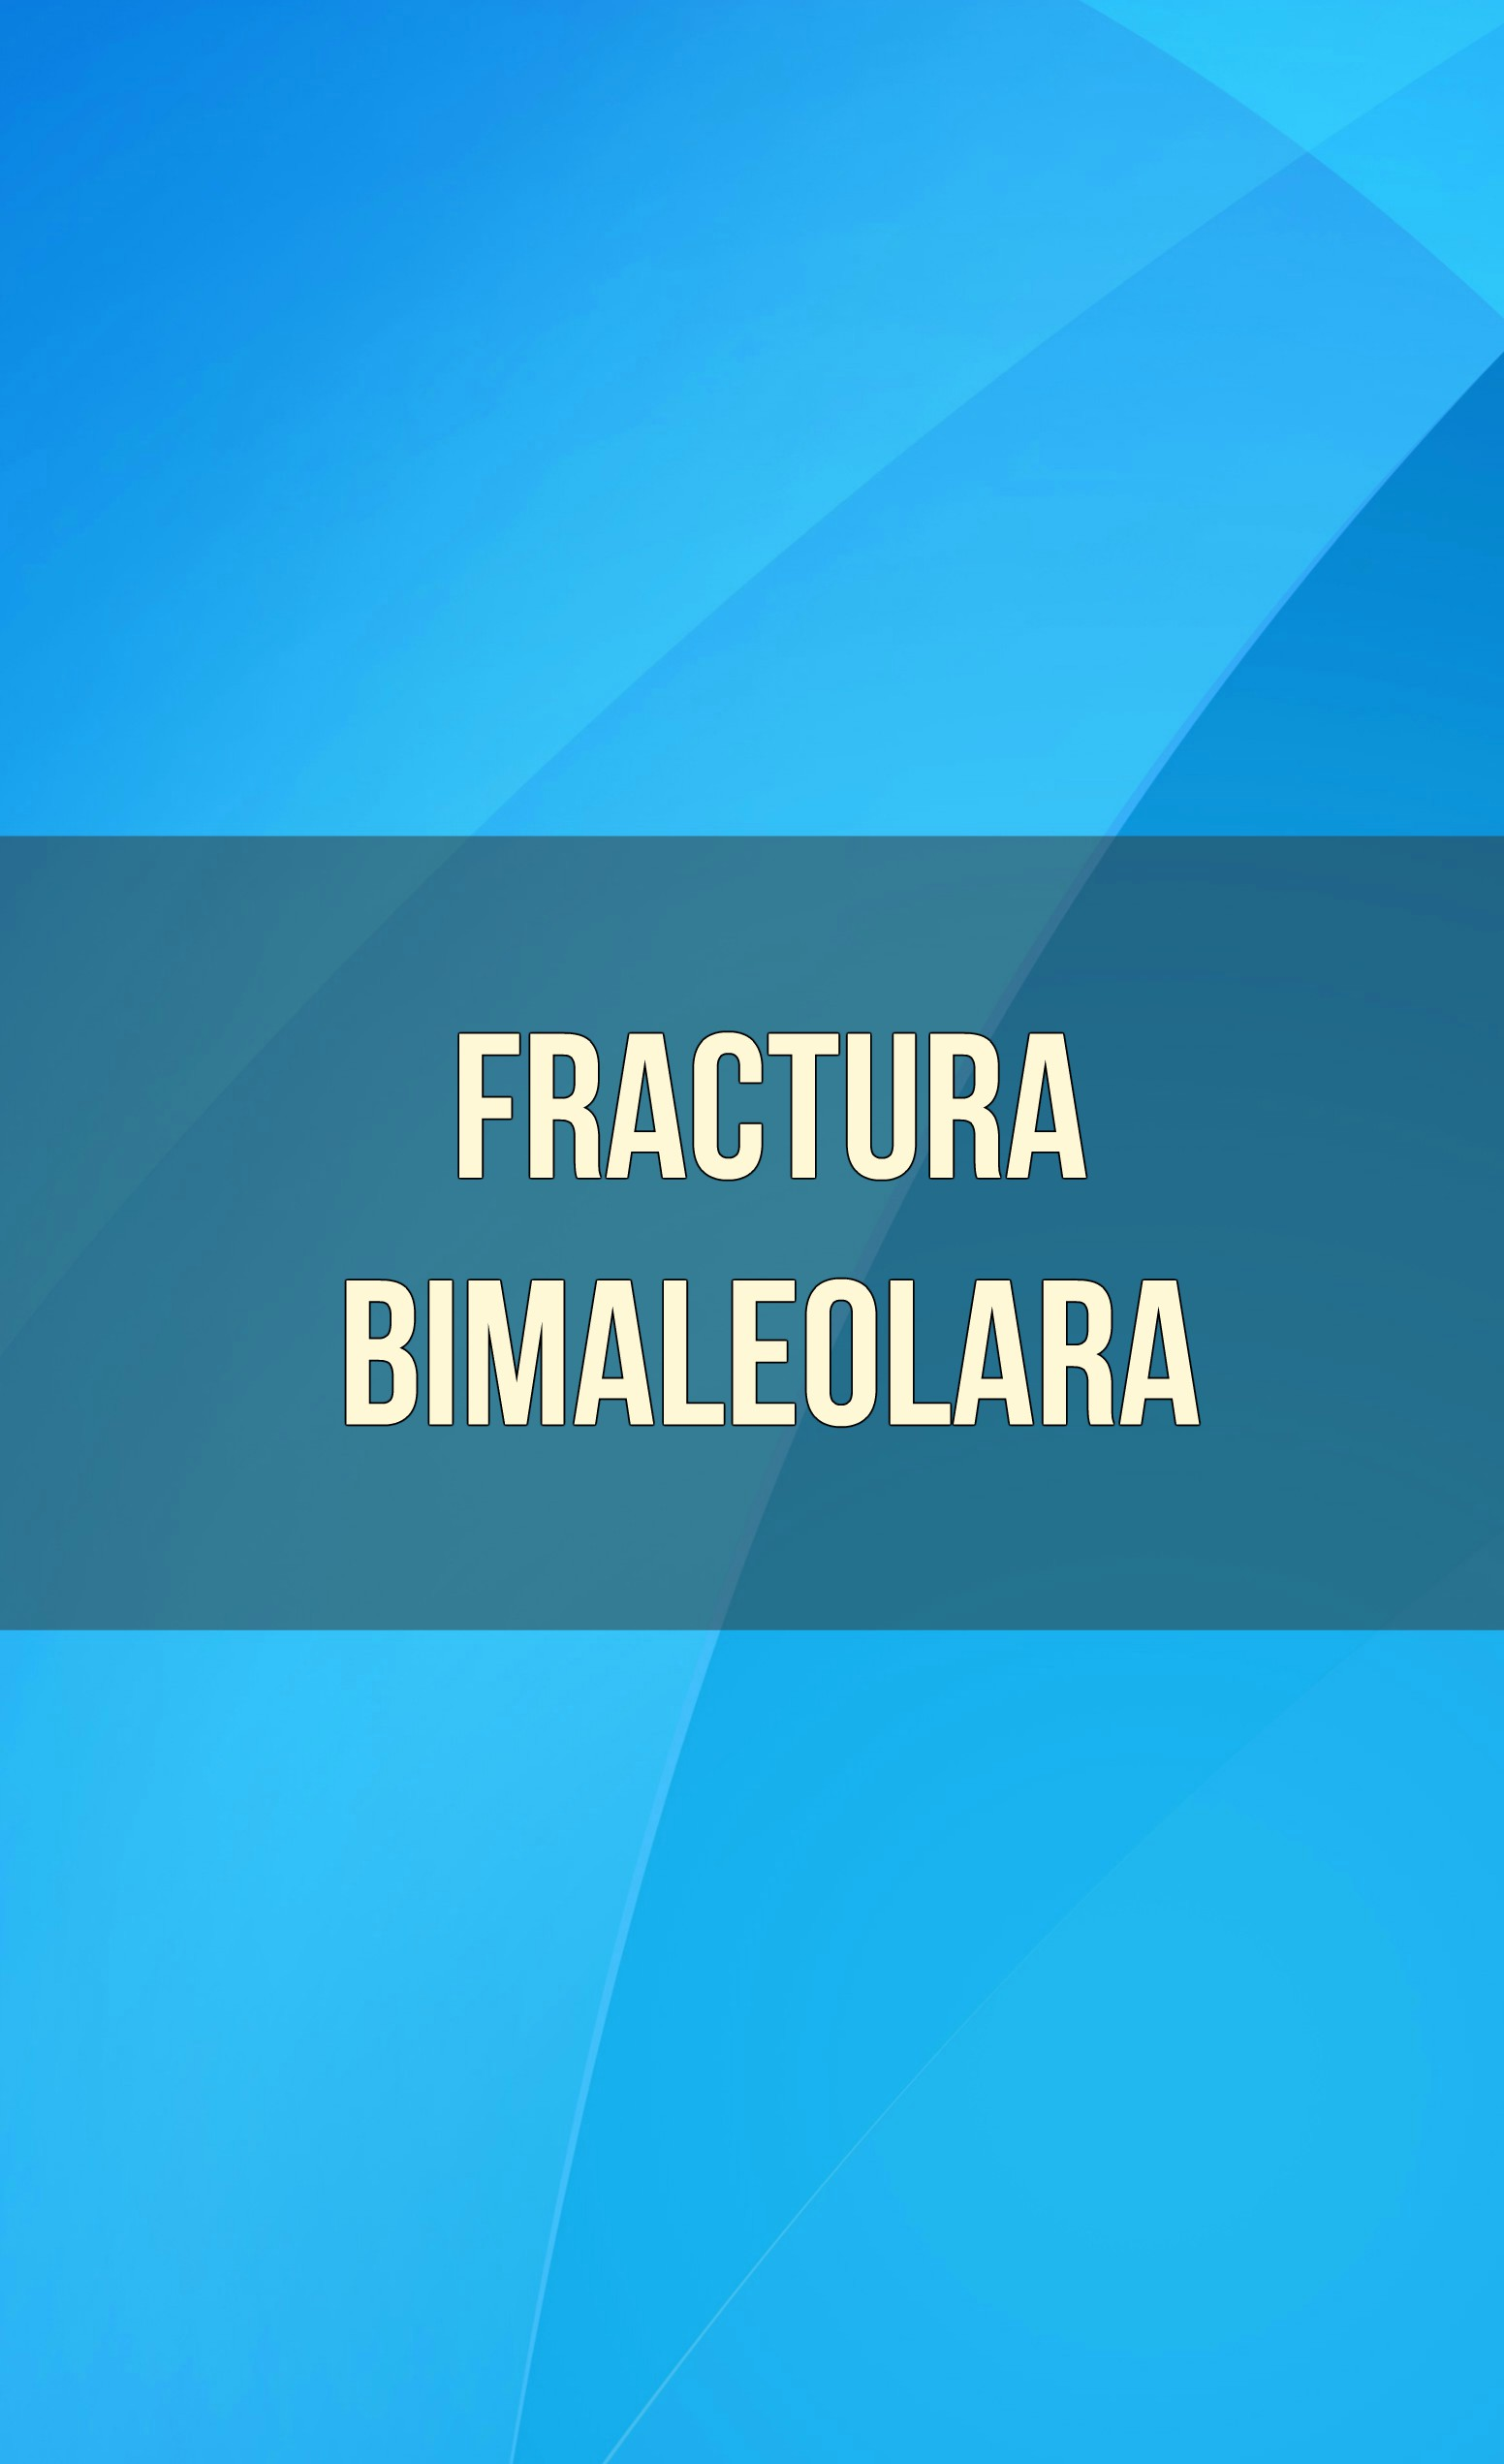 fractura bimaleolara